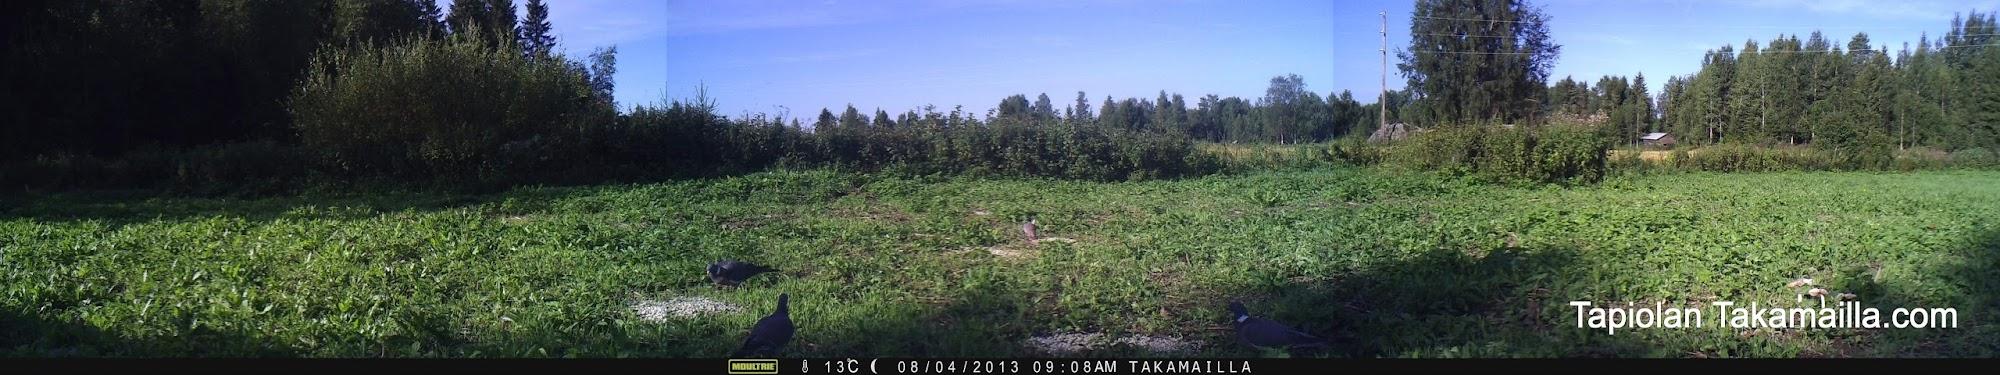 Moultrie Panoramic 150 maastossa